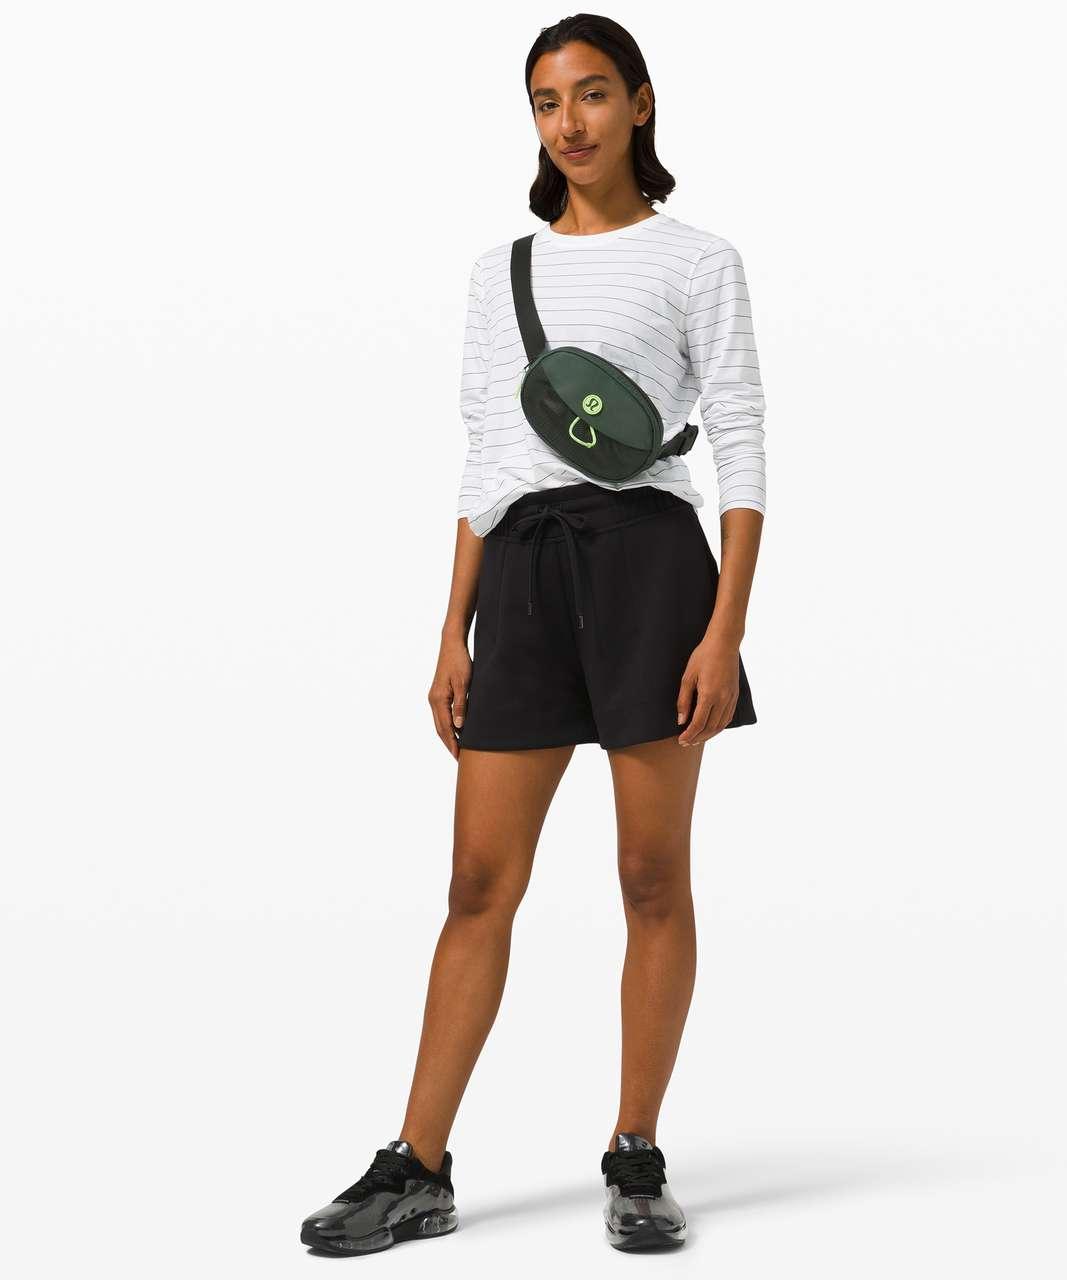 Lululemon Take It On Belt Bag *1L - Smoked Spruce / Neo Mint